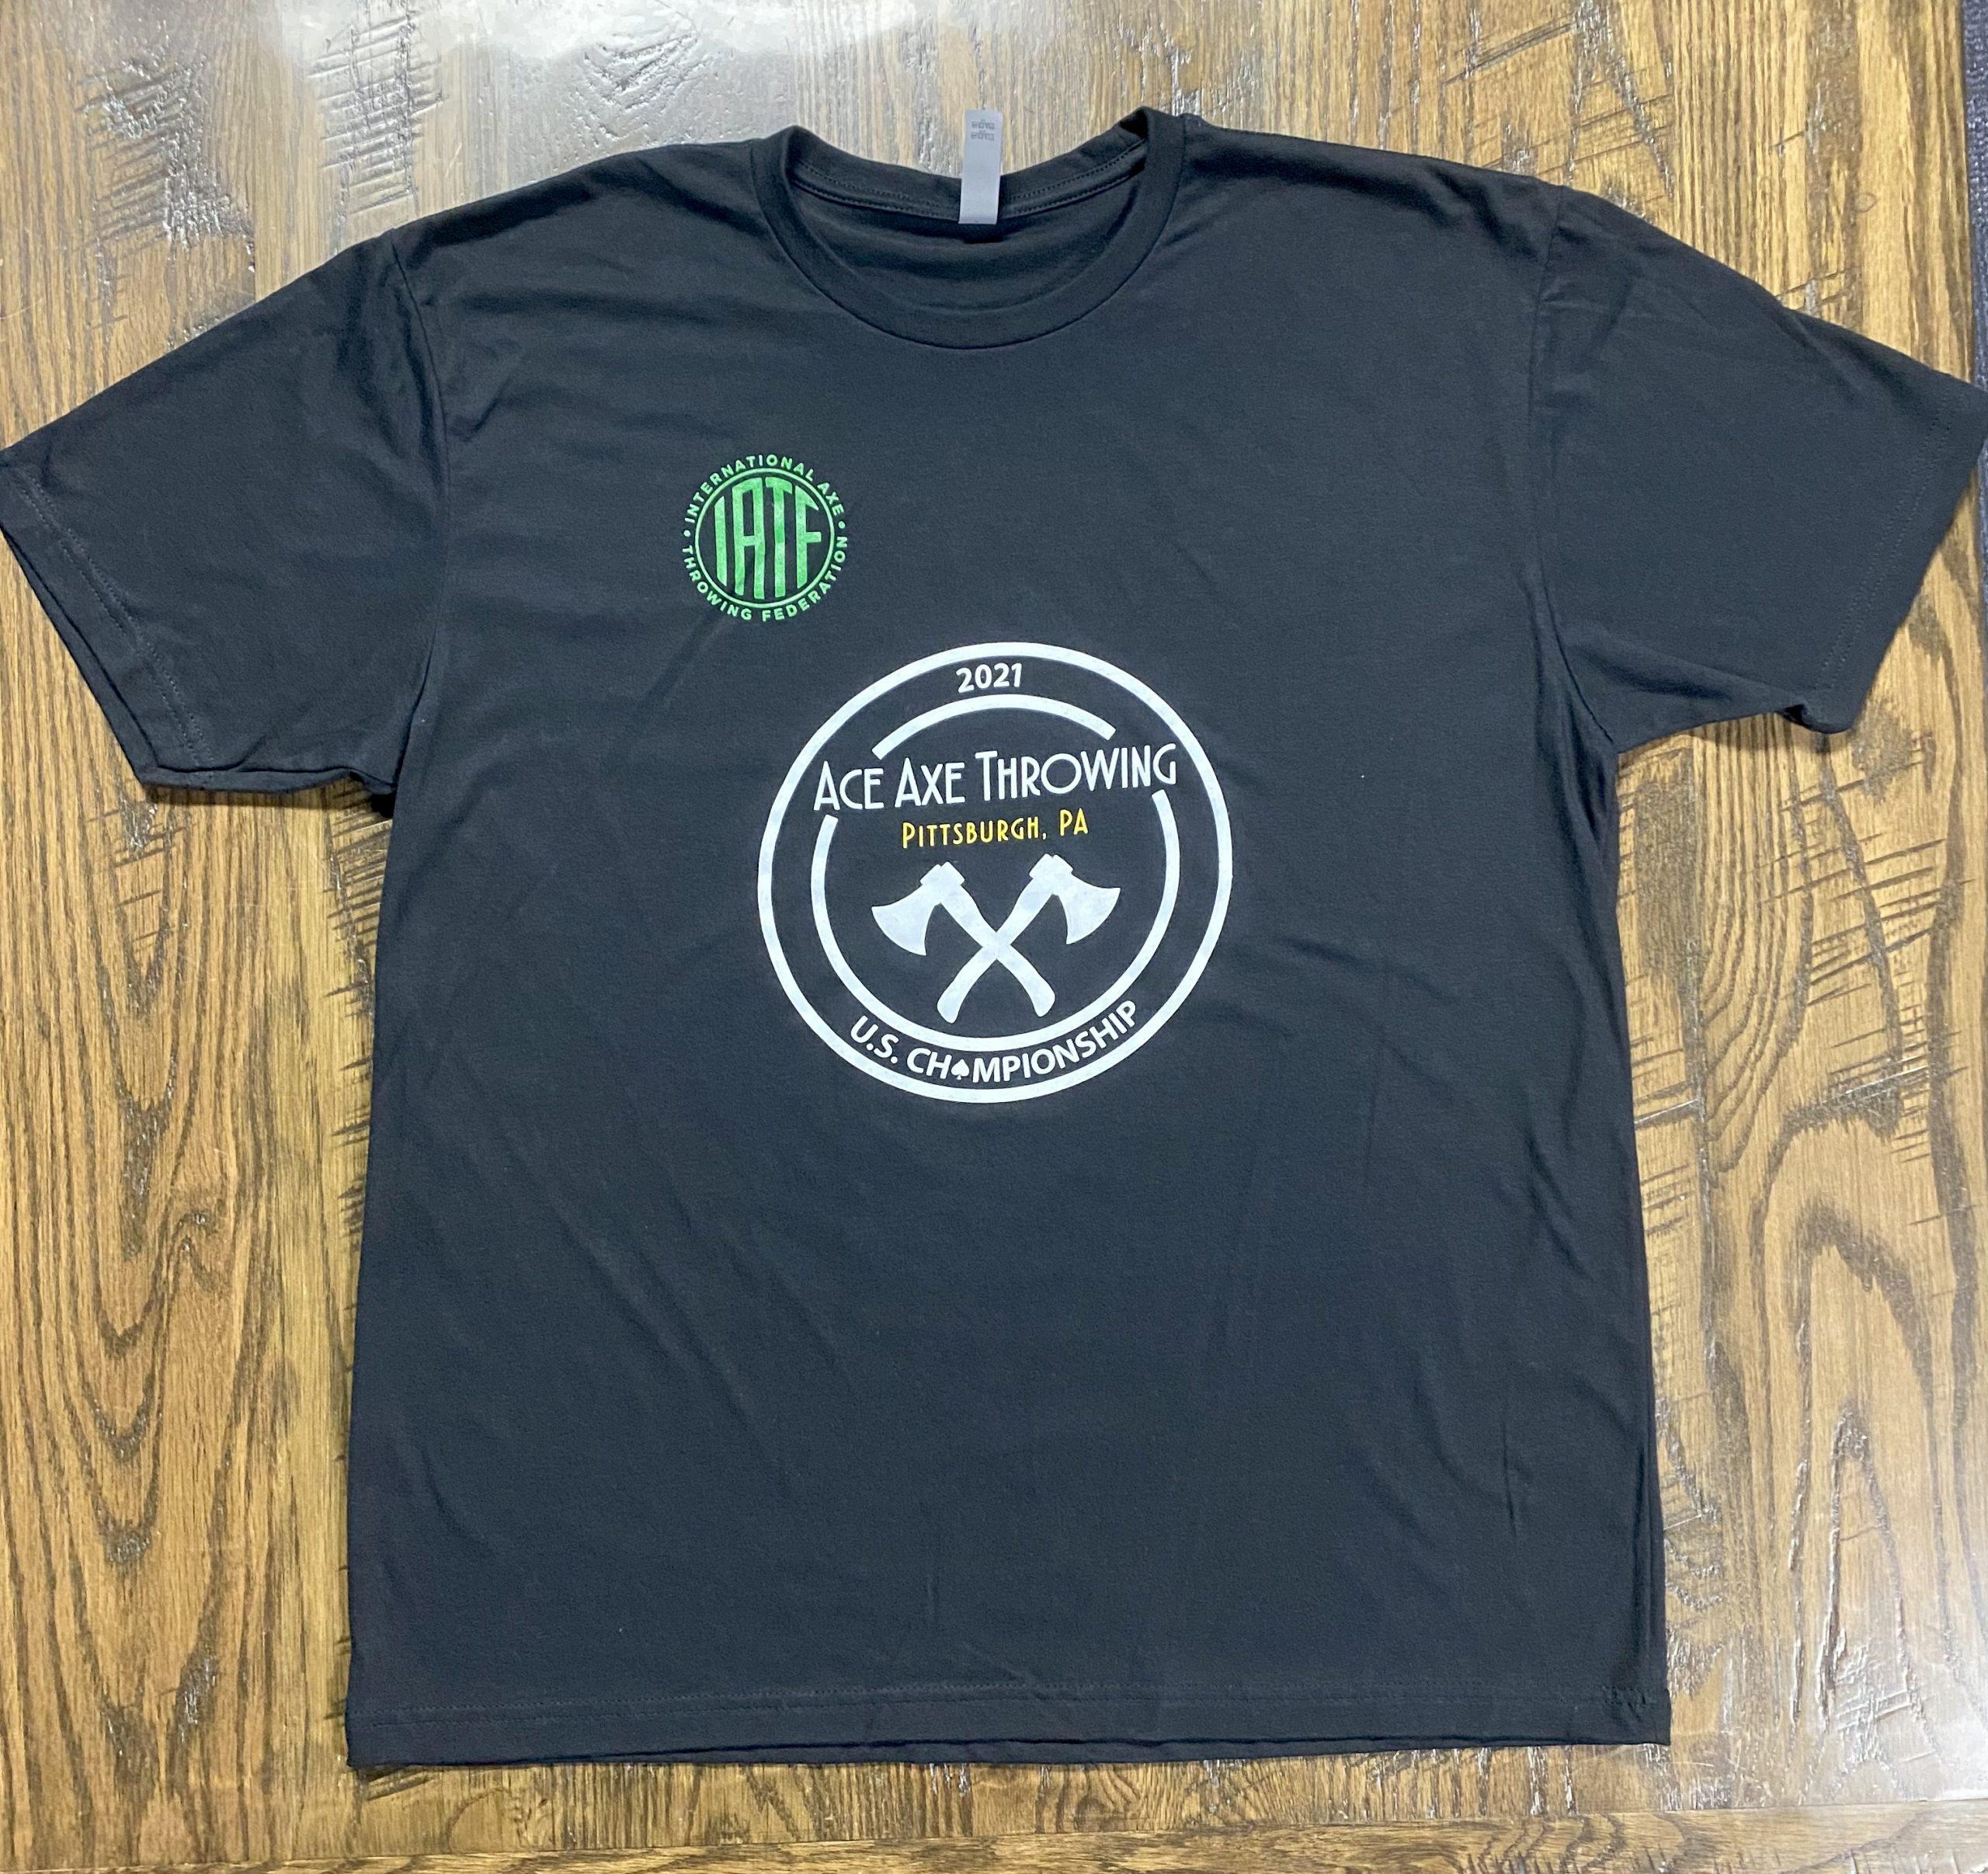 Ace Axe Throwing U.S. Championship T-Shirt